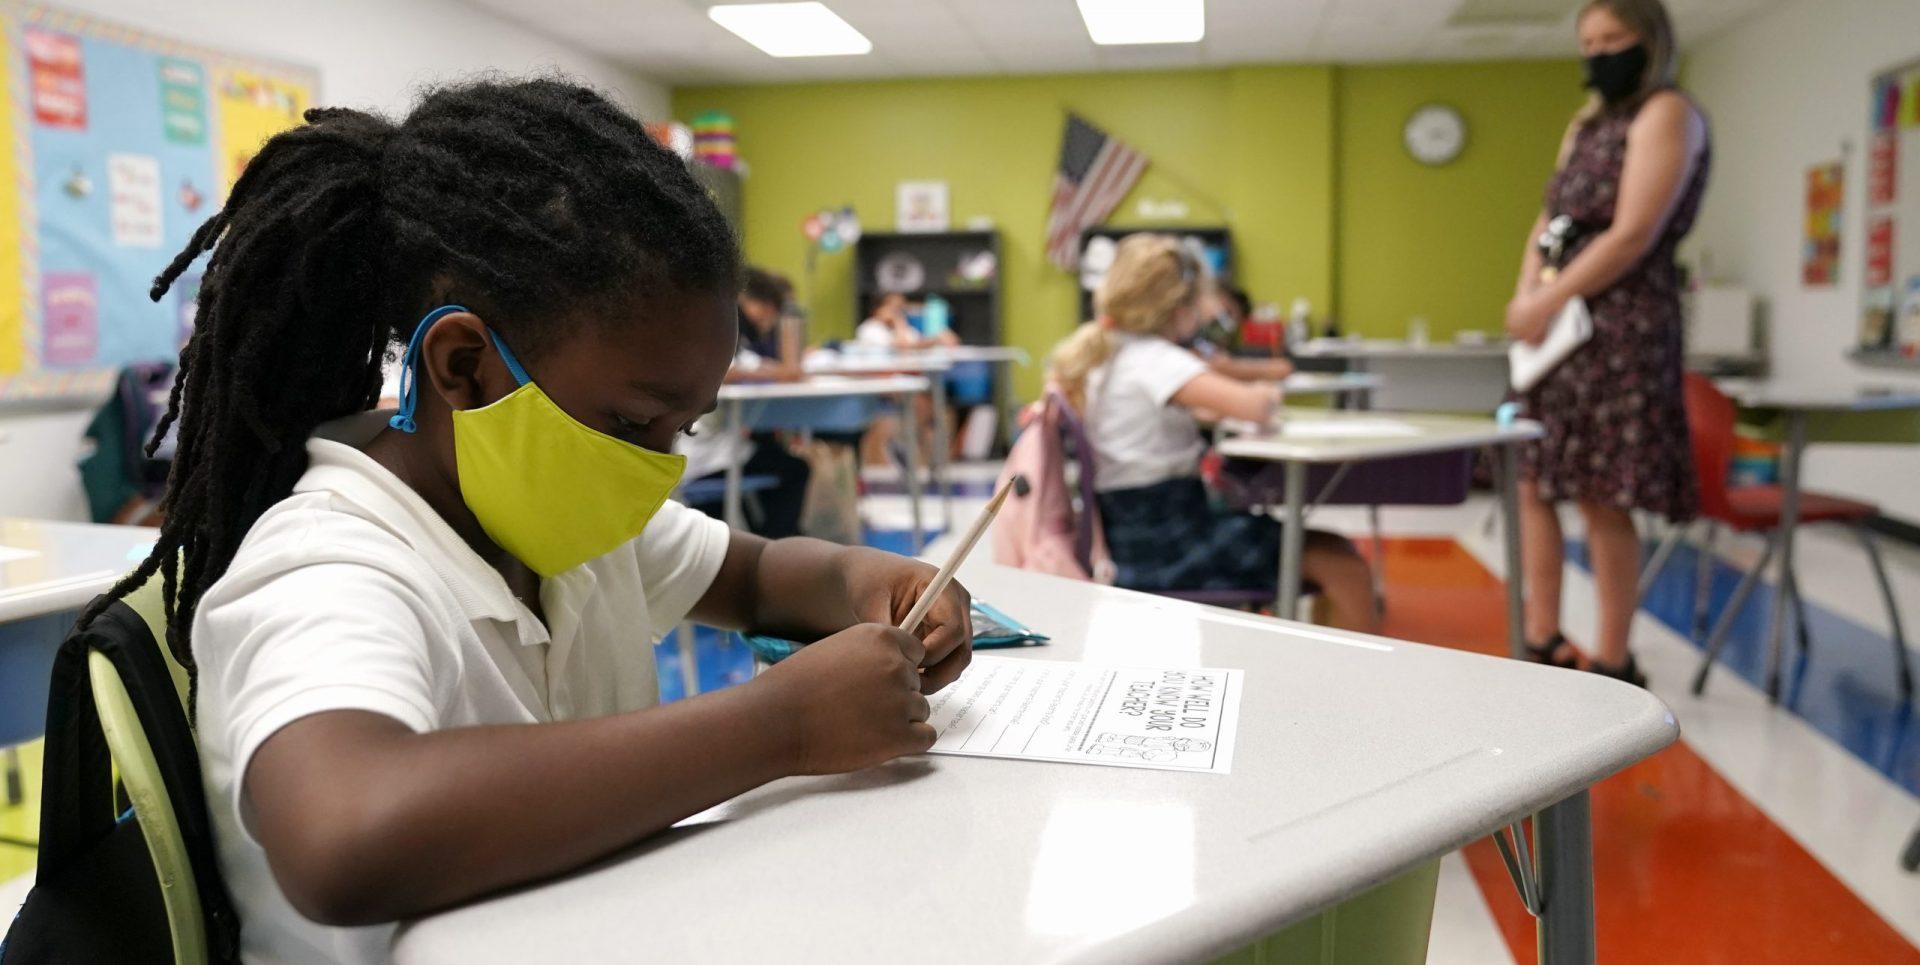 Students in Pennsylvania School